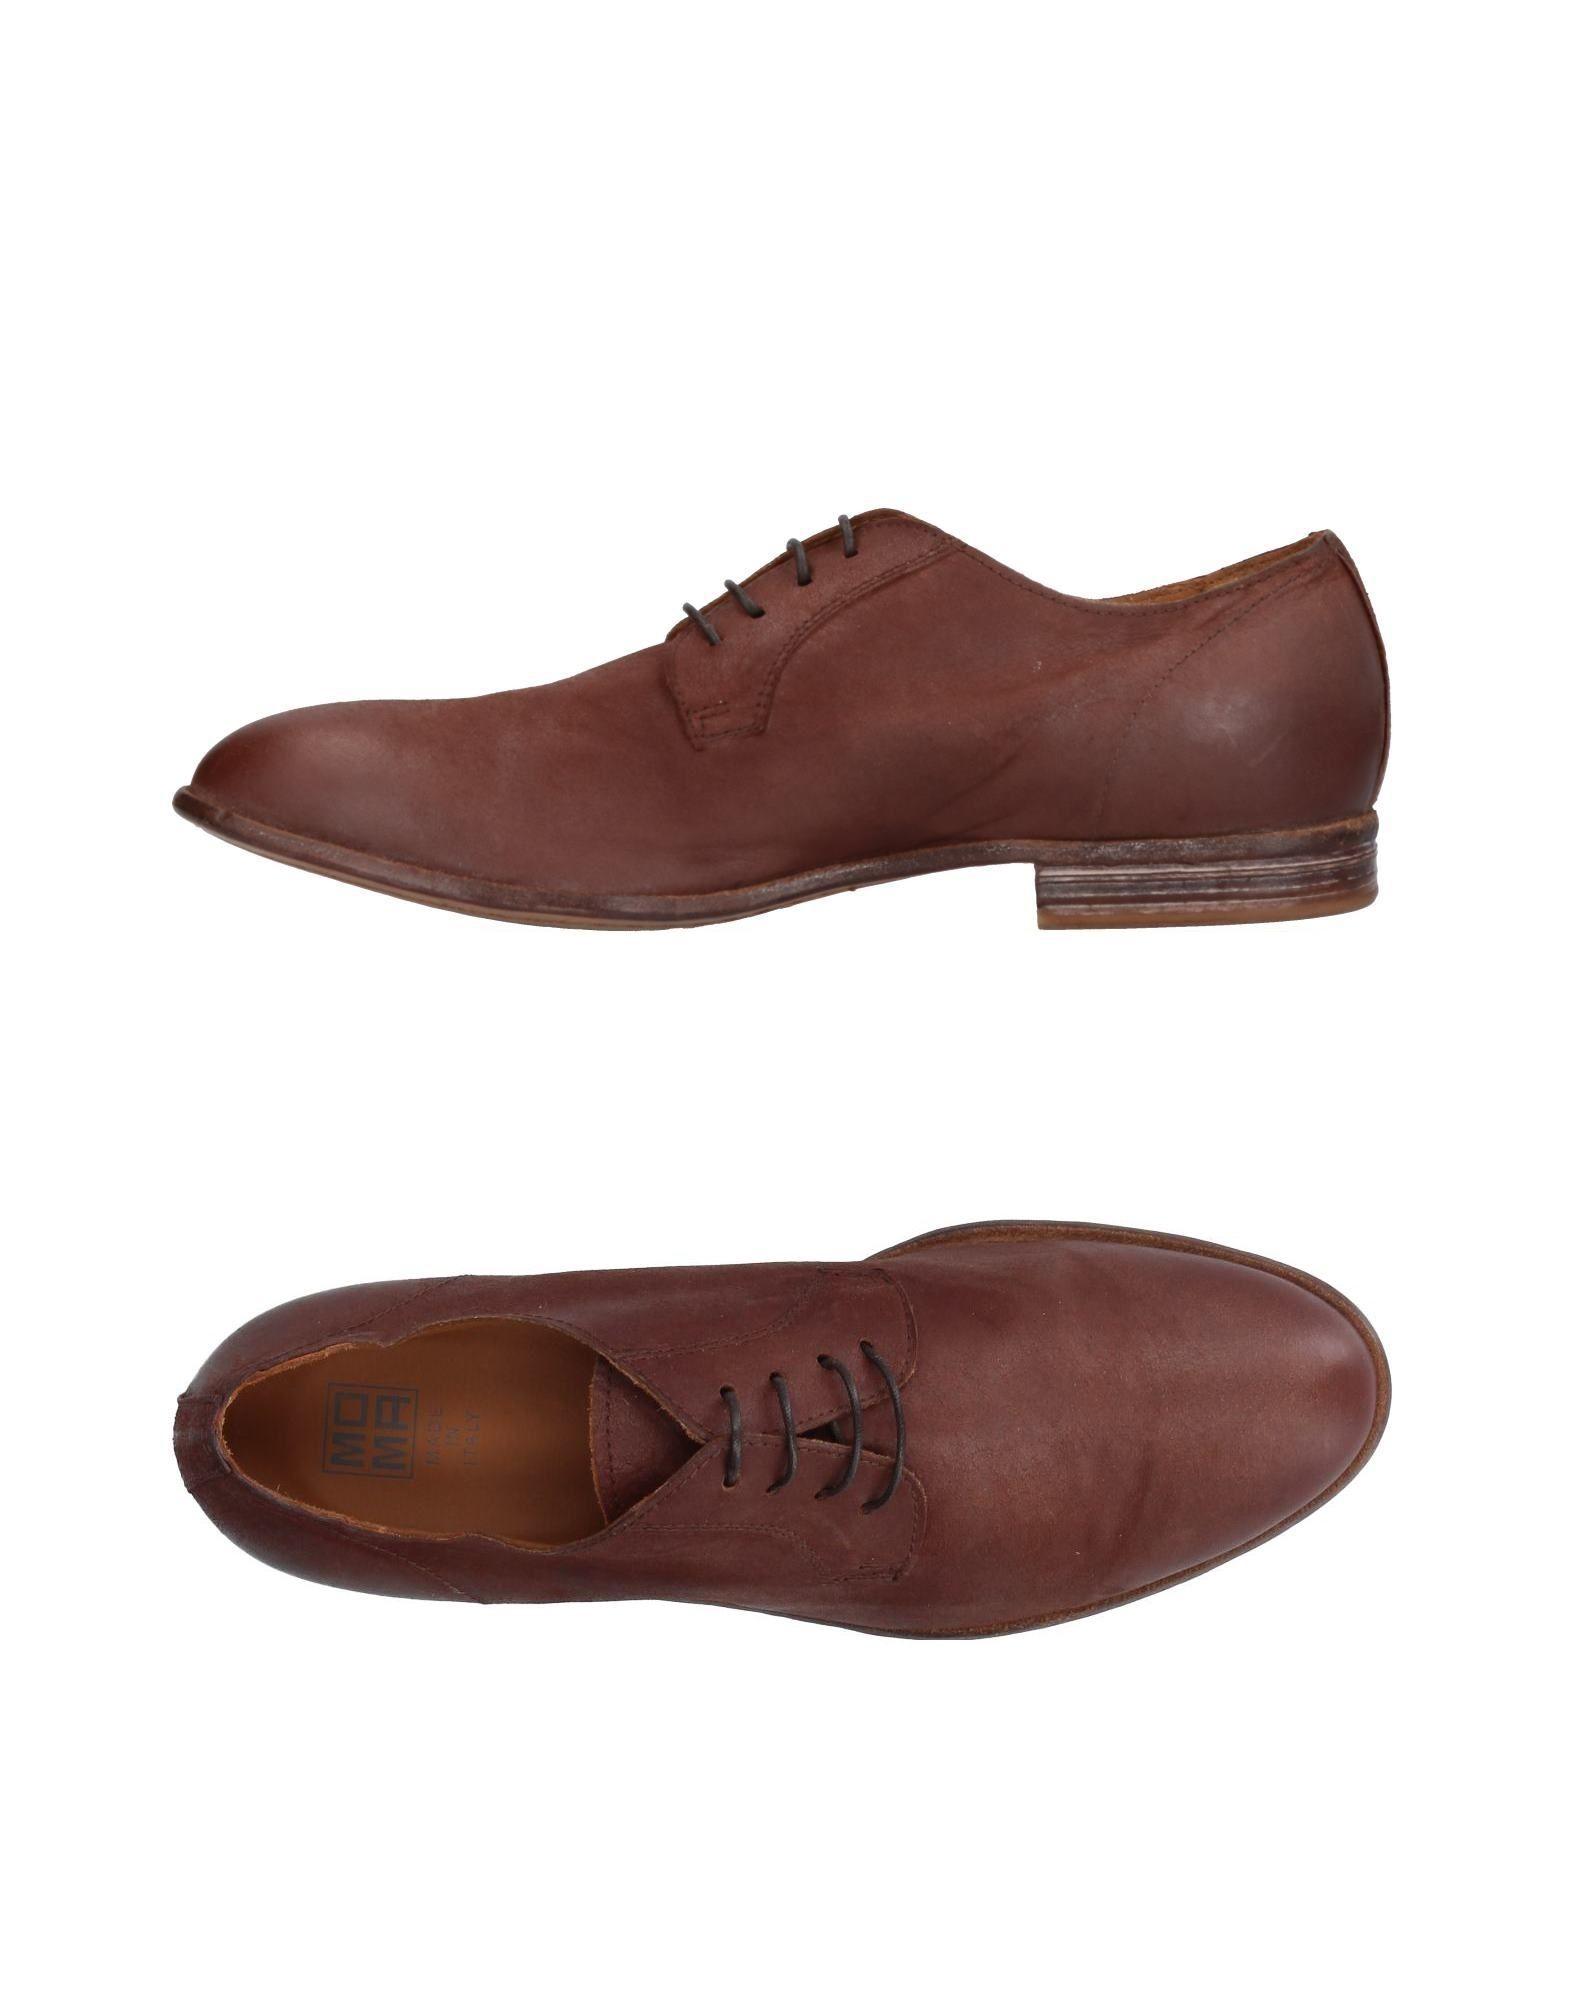 Moma Schnürschuhe Herren  11412053TT Gute Qualität beliebte Schuhe